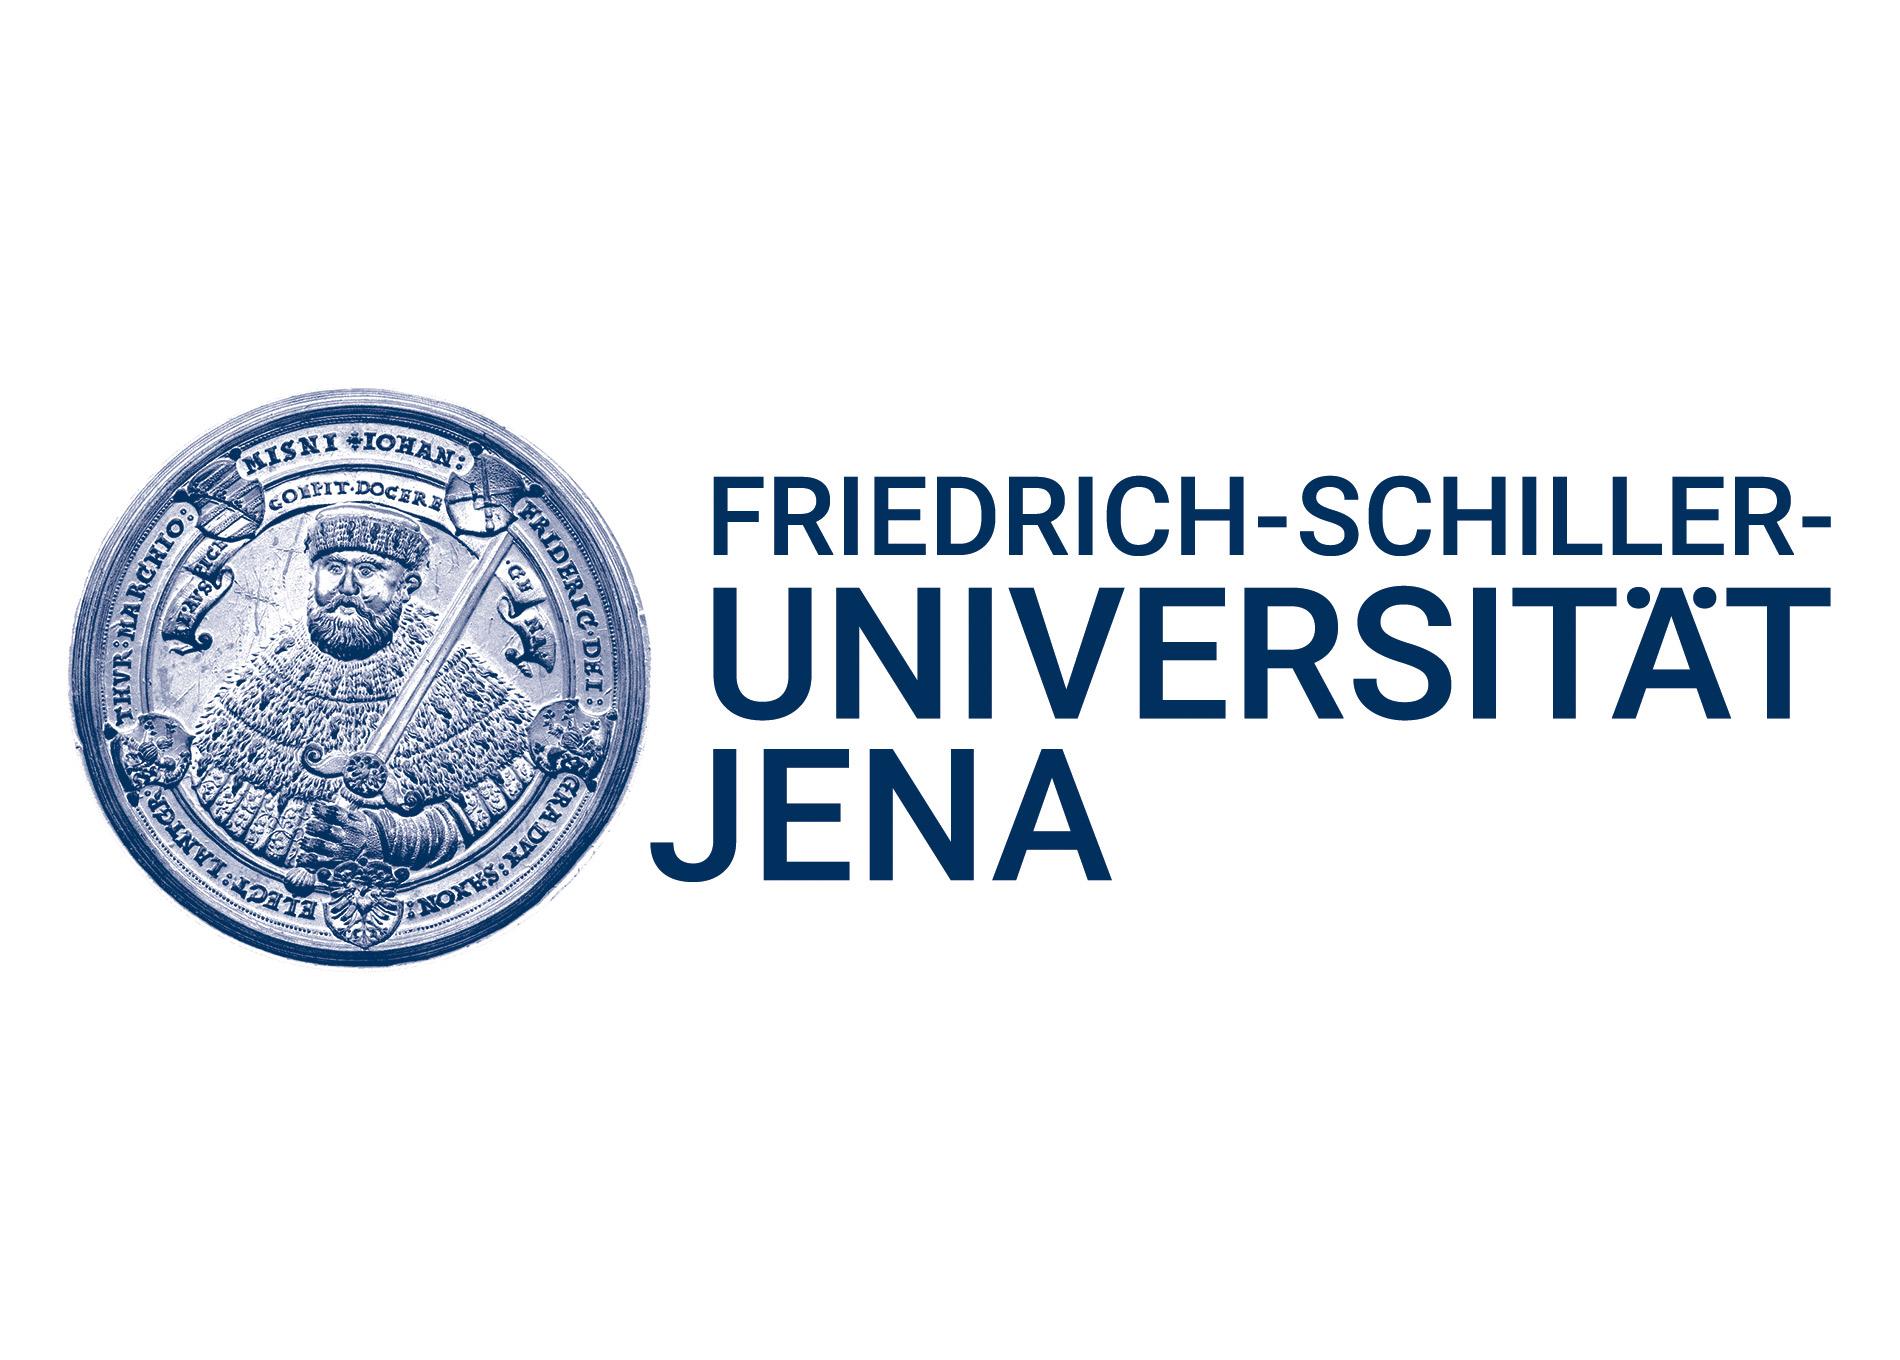 https://www.designtagebuch.de/wp-content/uploads/mediathek//2017/07/uni_jena_logo.jpg